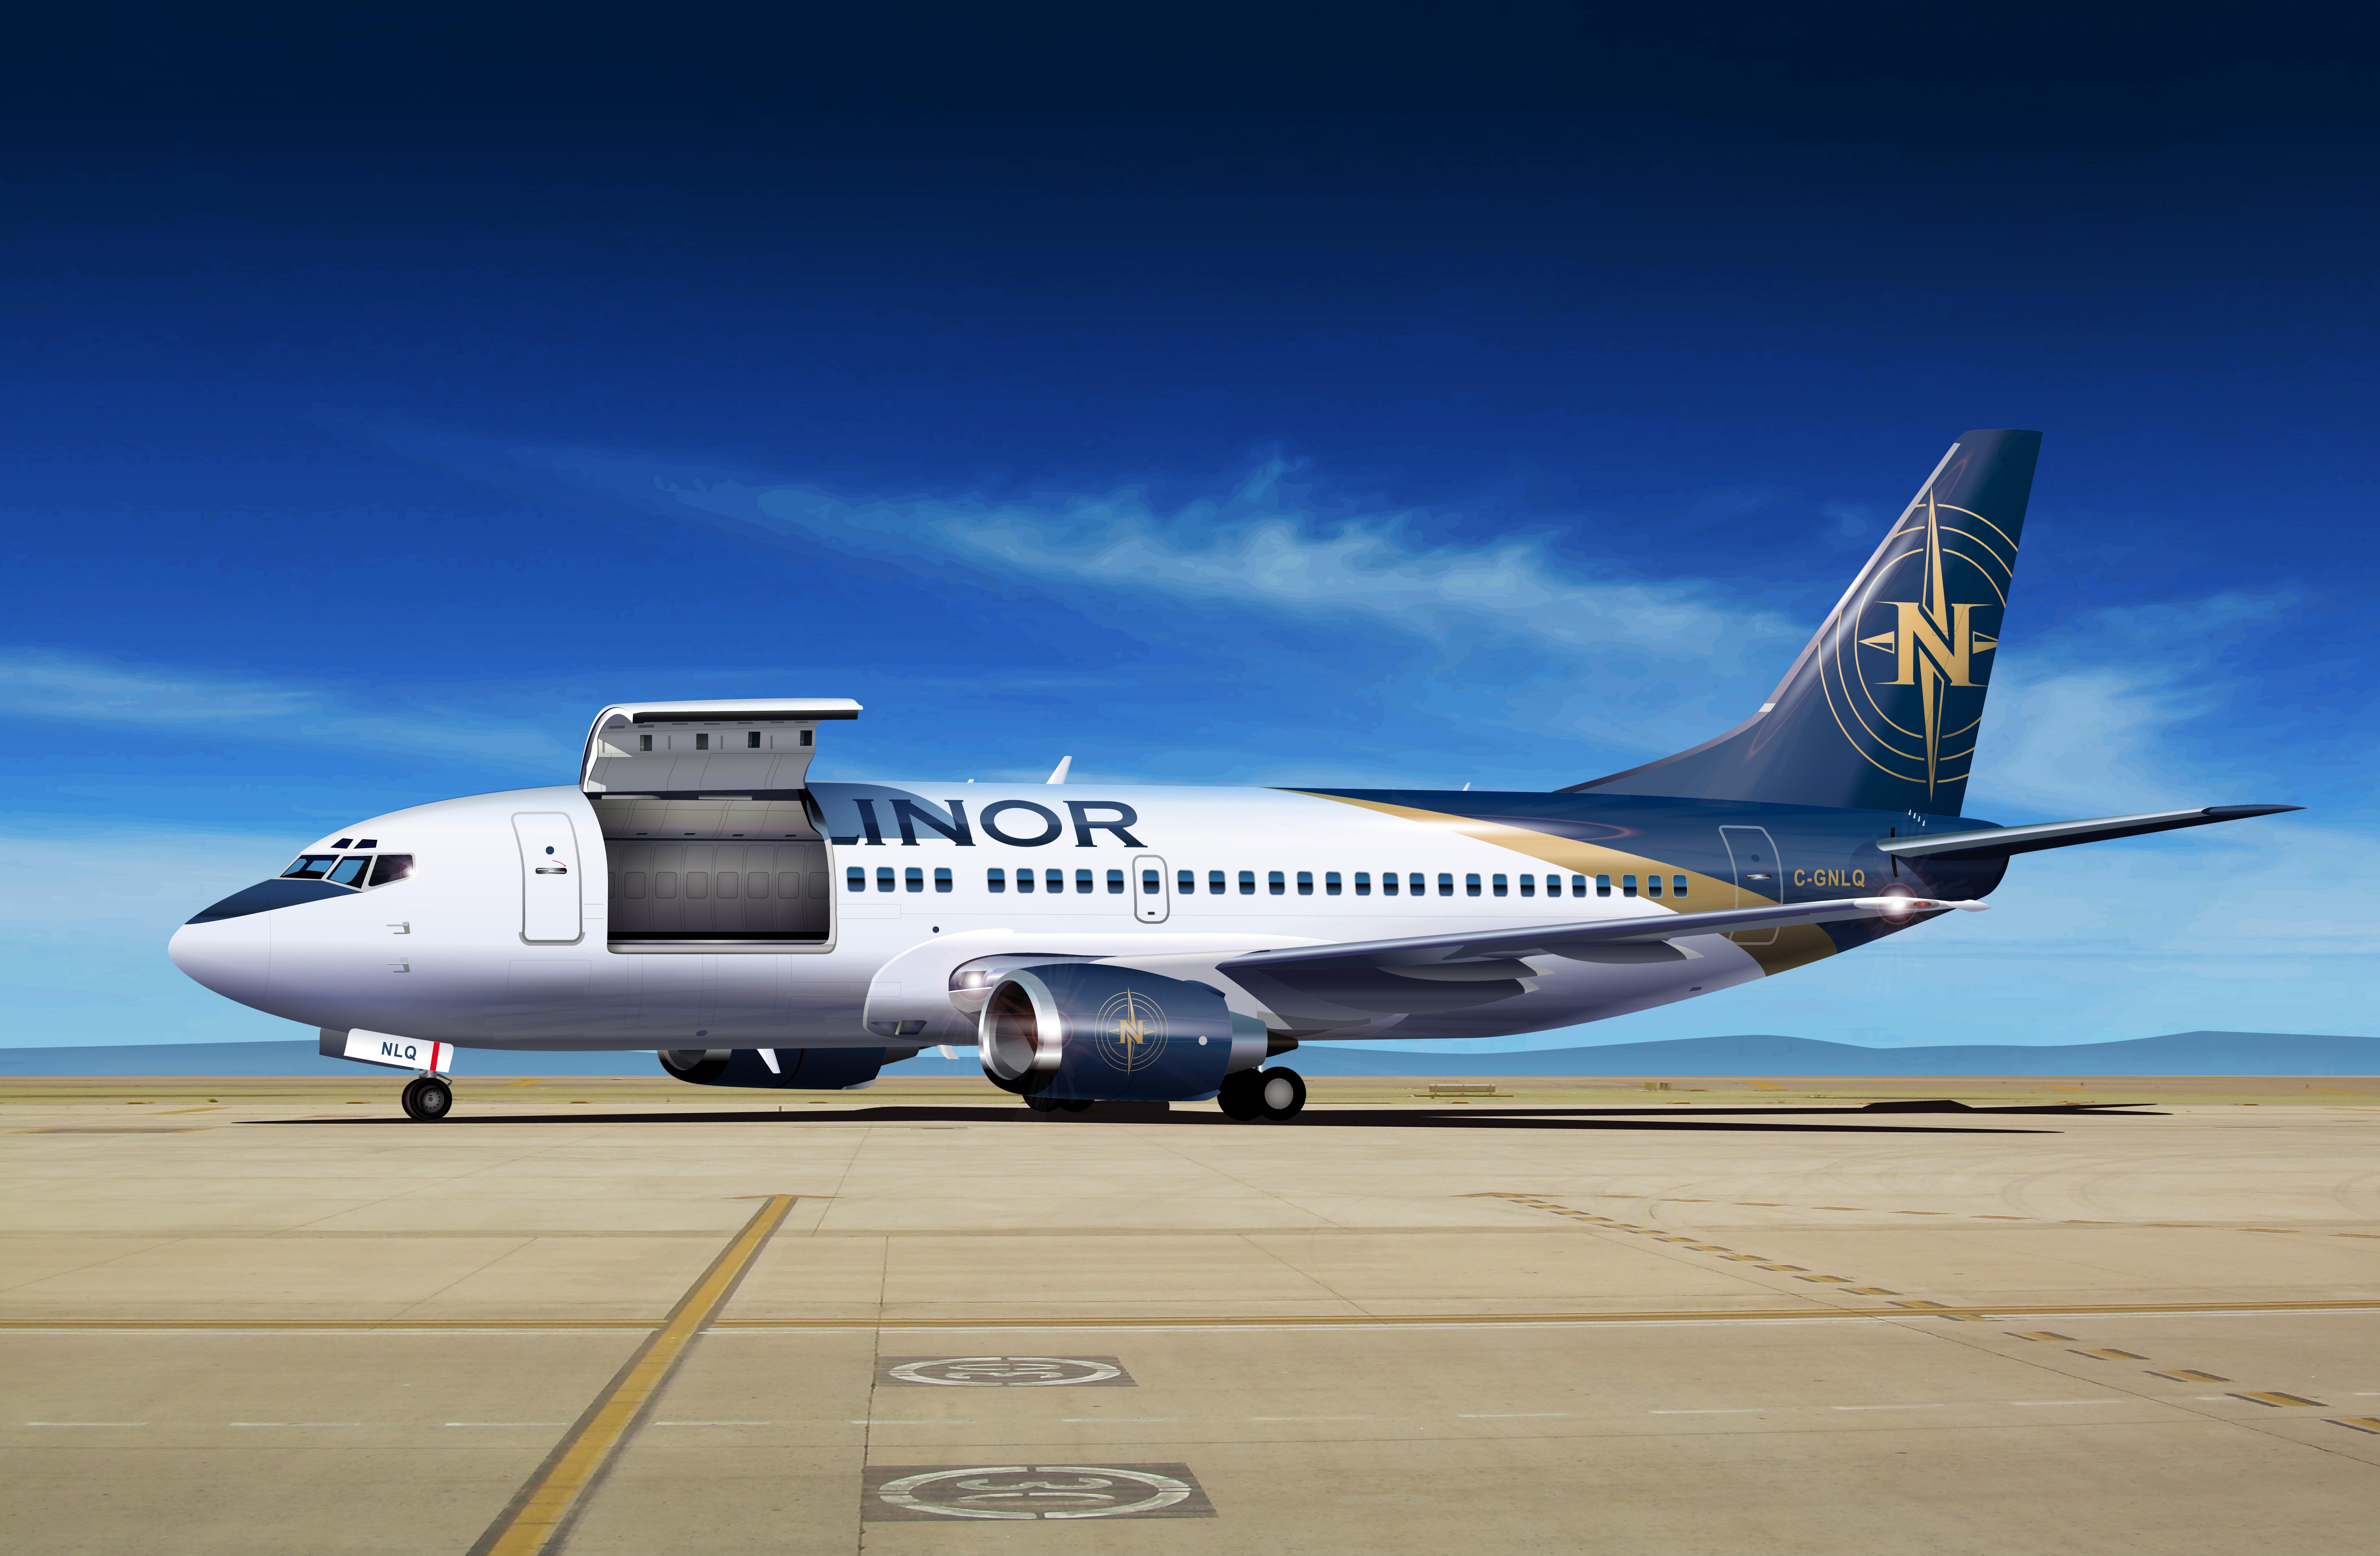 boeing 737 aircraft aviation - photo #3